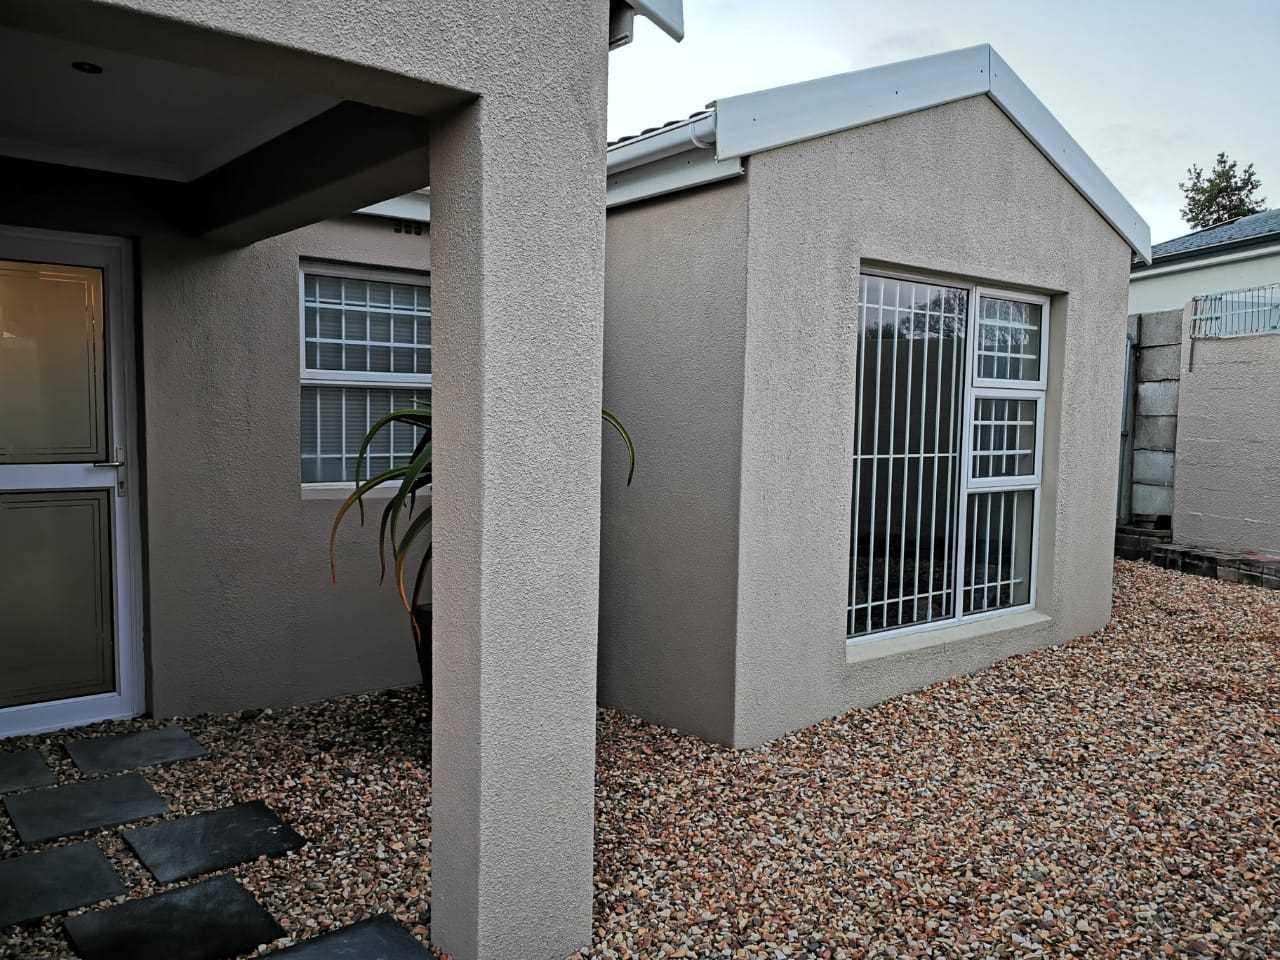 De Bron Terrific Dual Living Home 416m2 at R2,900,000